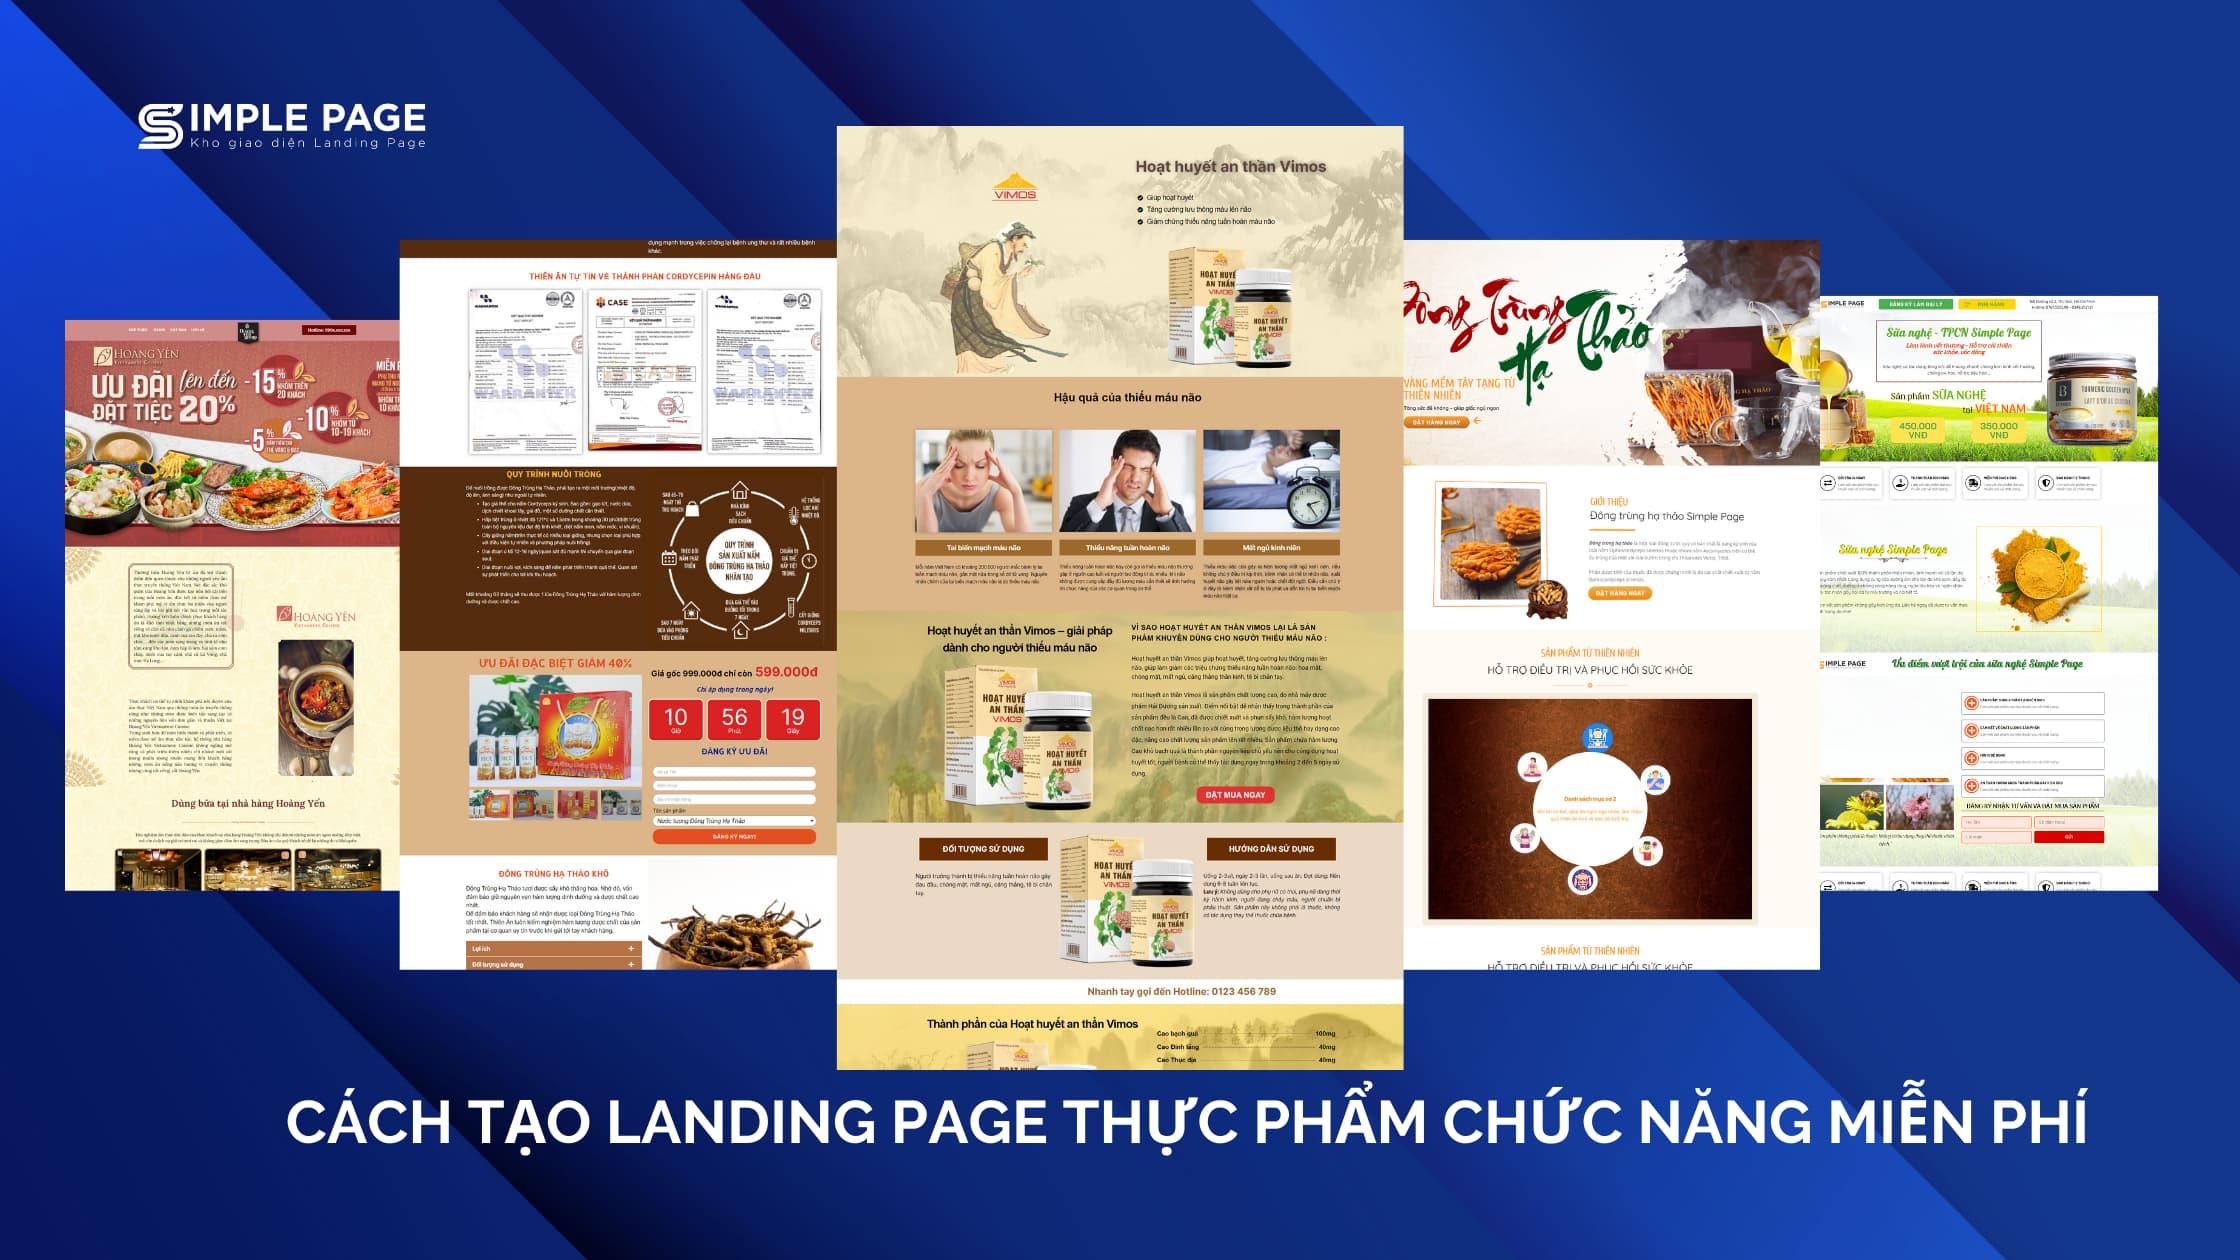 cach-tao-landing-page-thuc-pham-chuc-nang-mien-phi